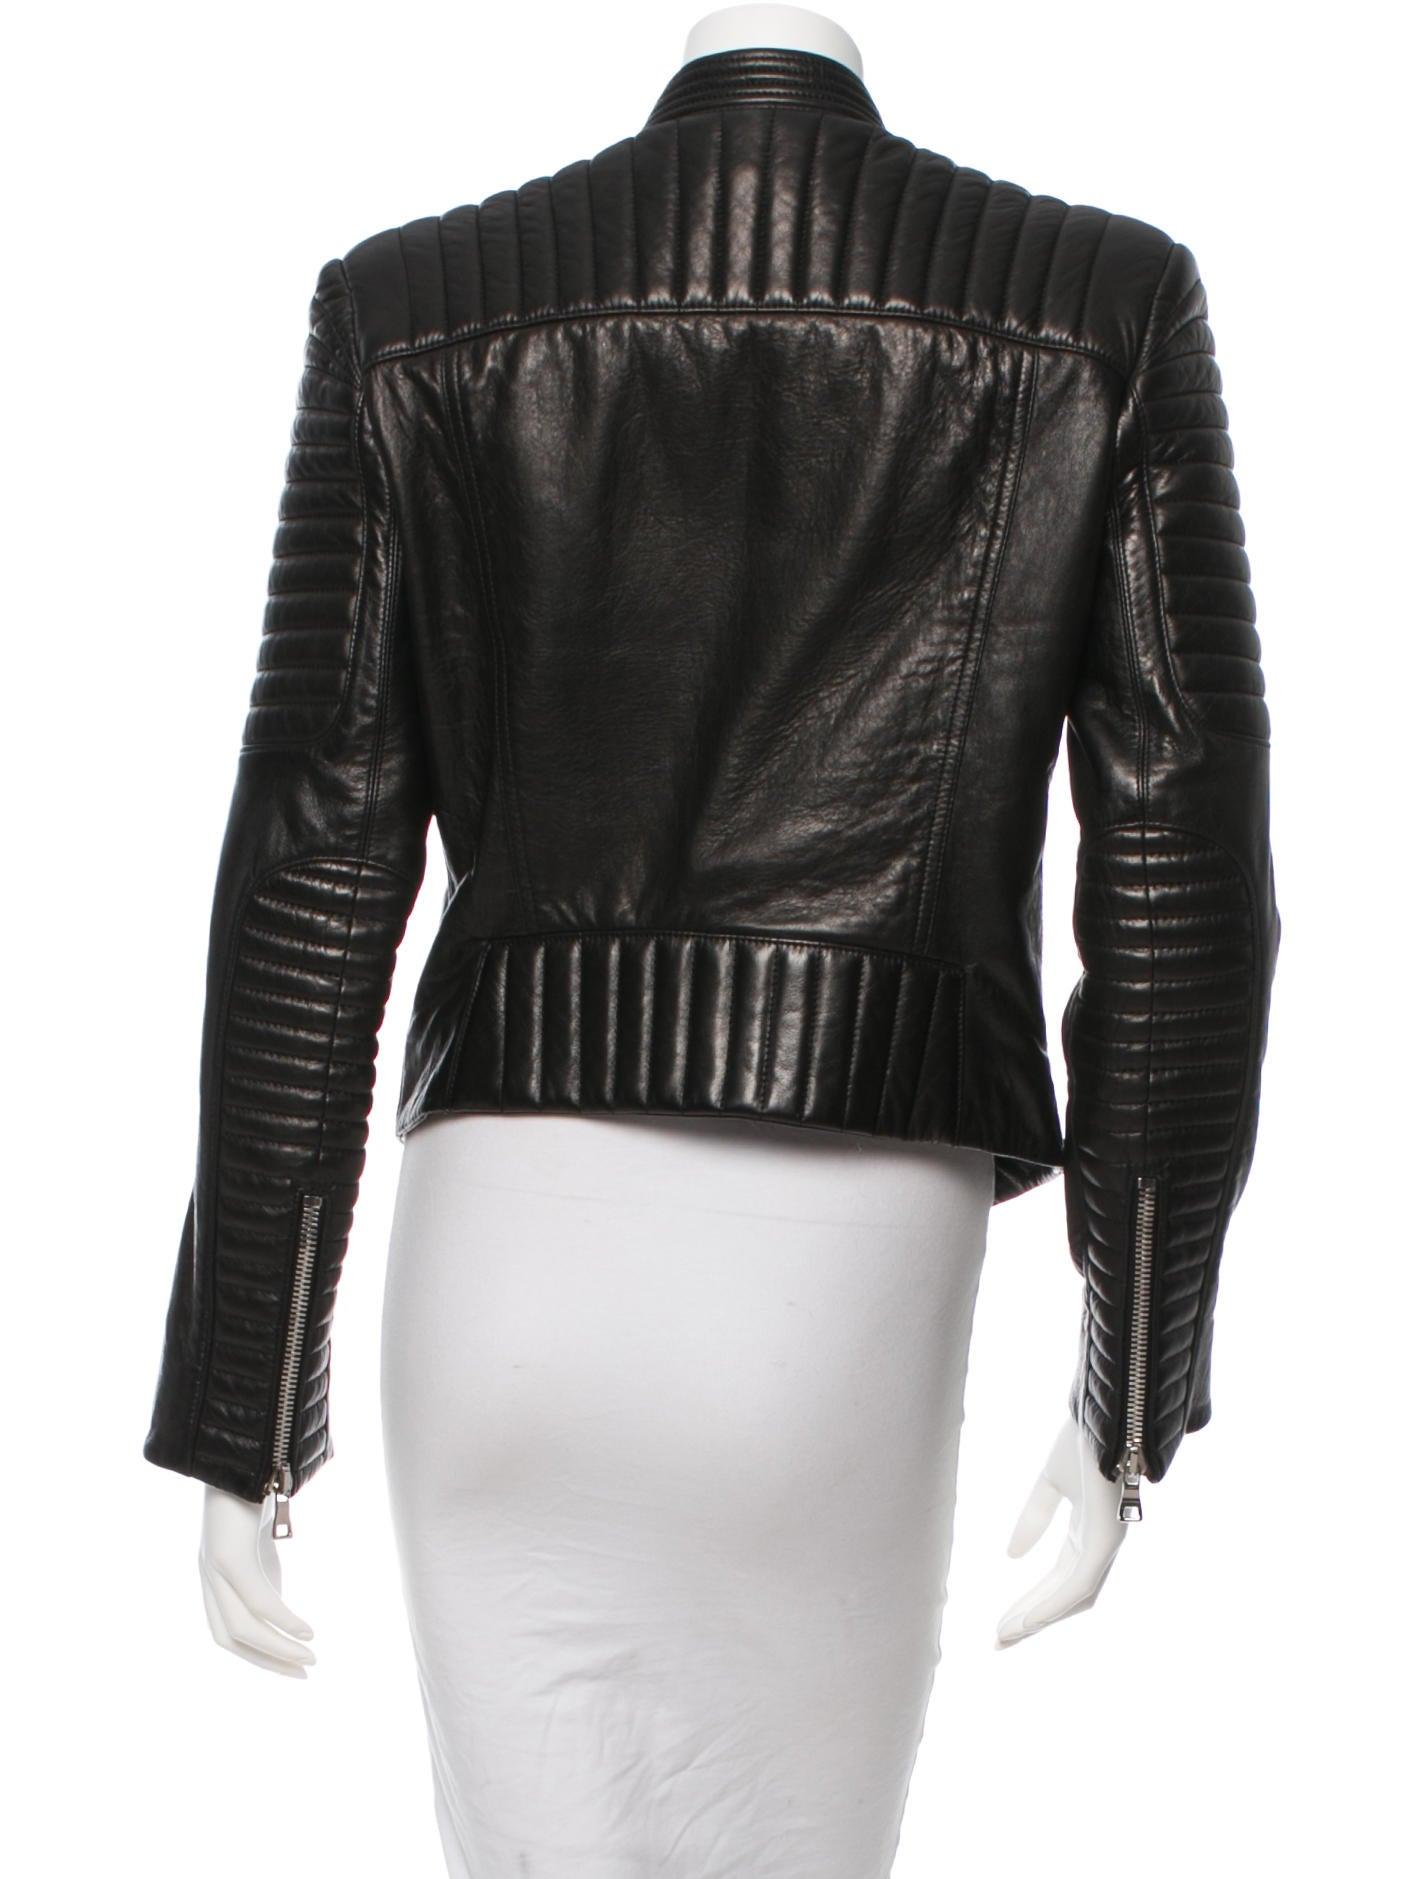 BALMAIN LONG WOMEN'S SUIT JACKETS COAT JEANS SHOES $ Last purchased about 13 hours BALMAIN LEATHER BLACK JACKETS COAT OUTERWEAR $ Bought by 5+ BALMAIN LONG STYLE WOMEN'S DRESS DUST COAT JACKETS $ Bought by 5+ BALMAIN Women's Retro style cotton suit jacket Slim.